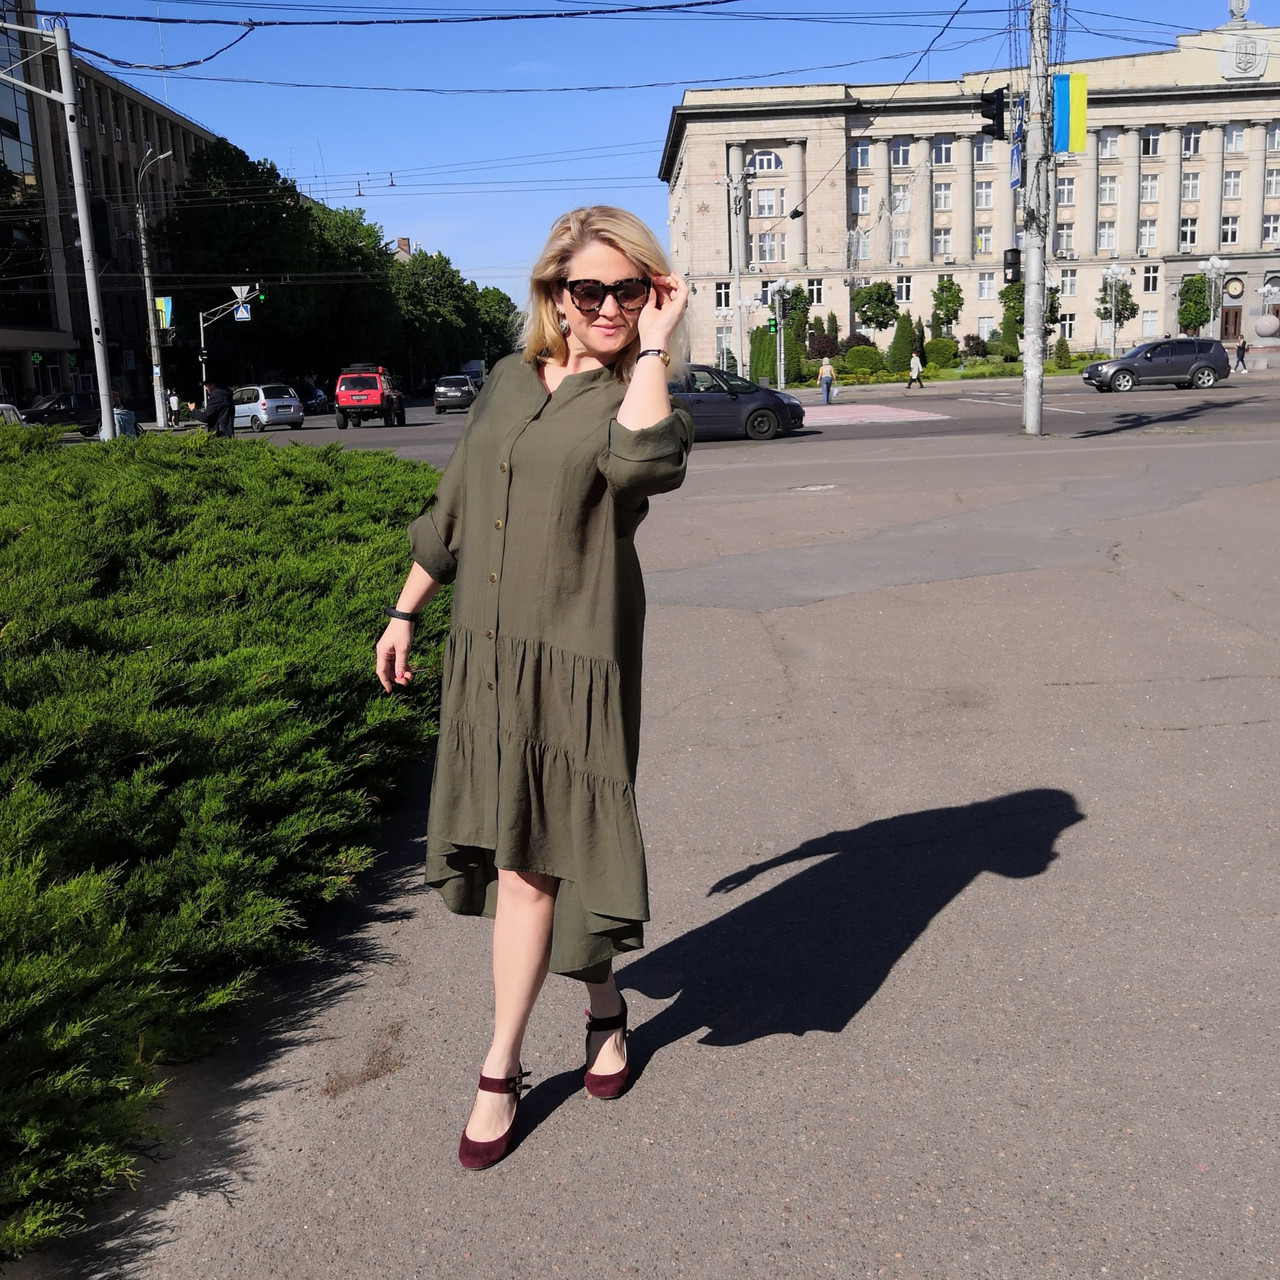 Платье 2020 лен нейлон, оверсайз Бохо. 50-56